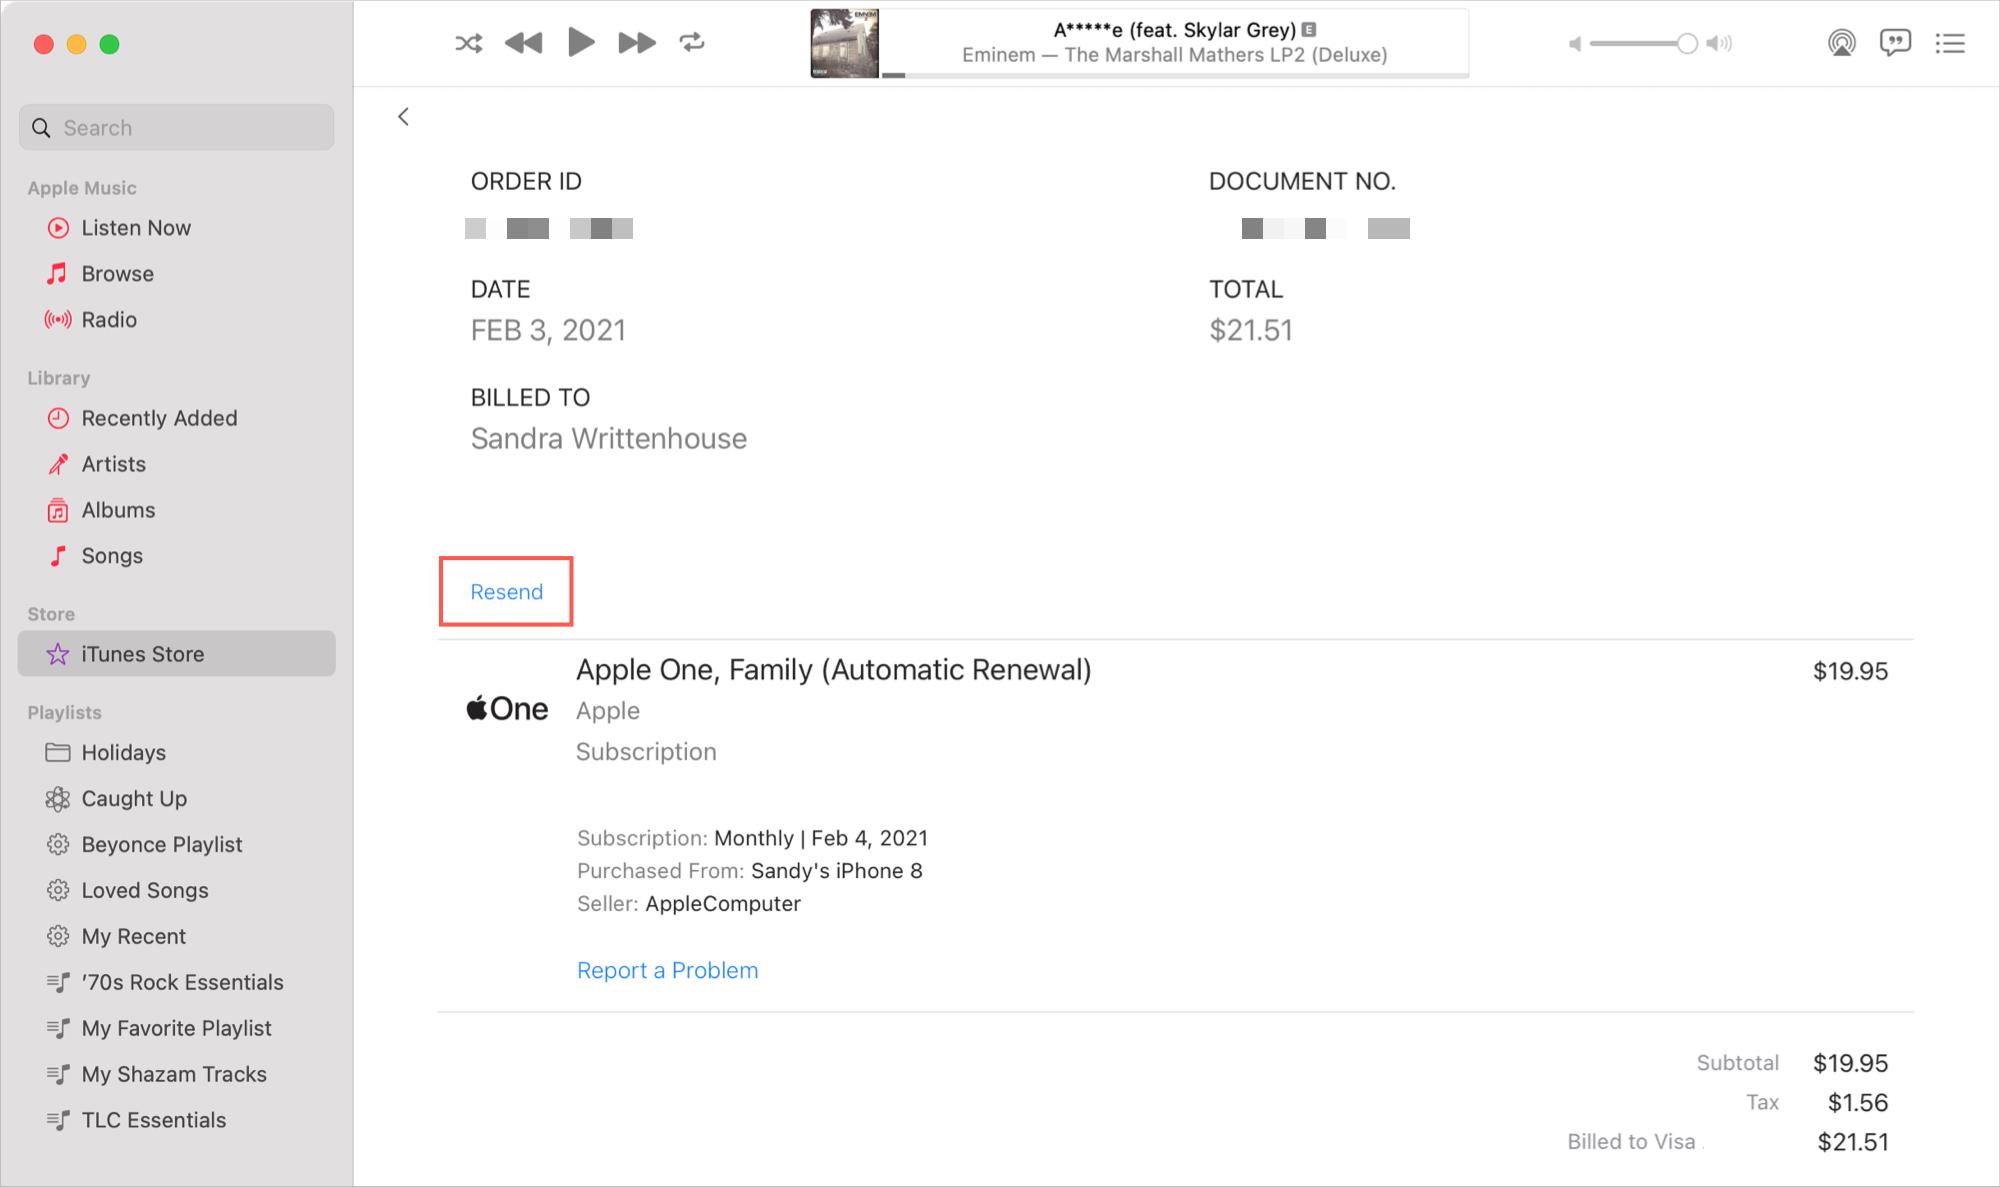 Purchase Receipt on Mac